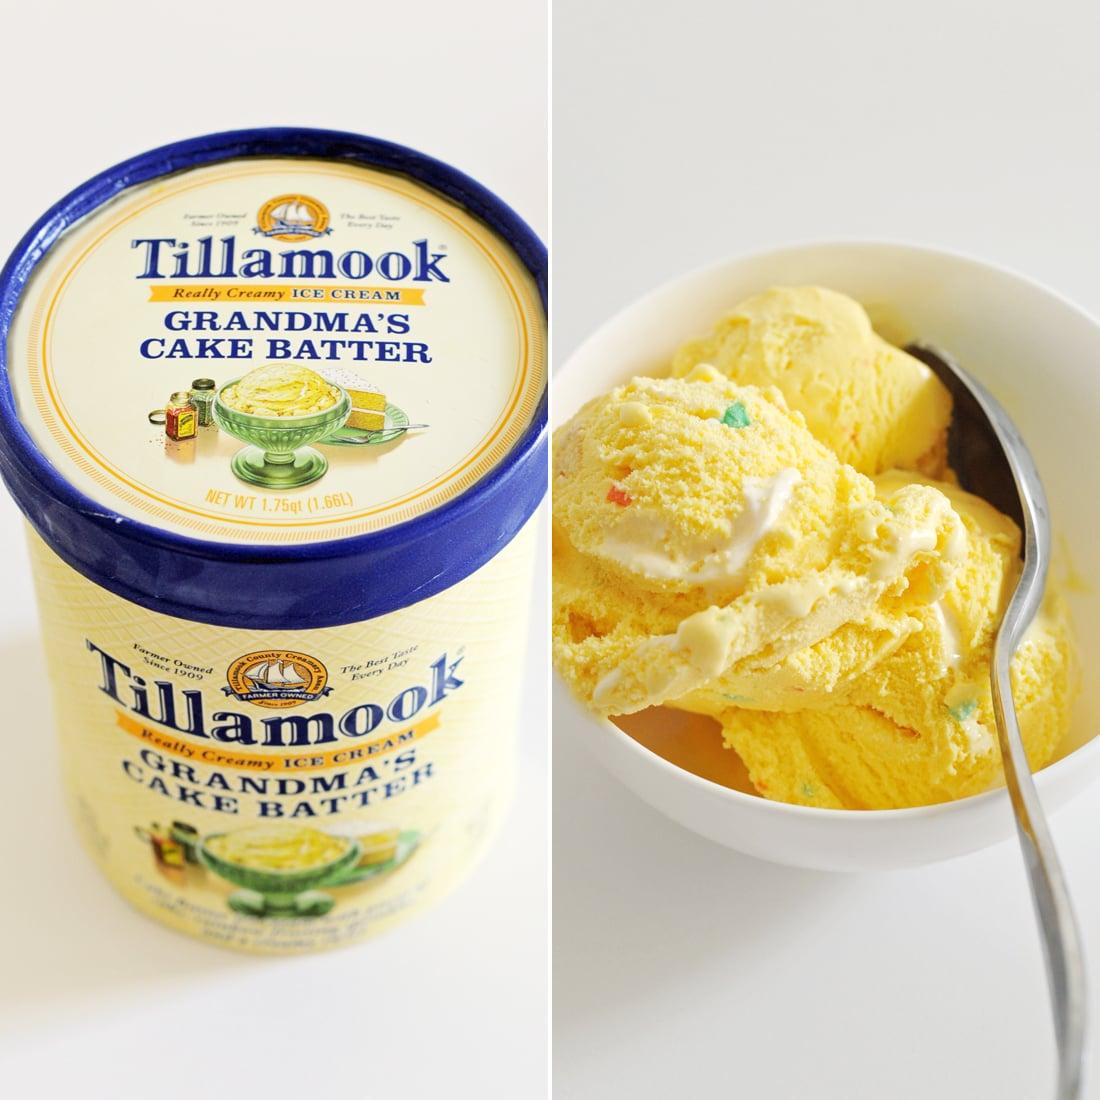 Tillamook Grandma's Cake Batter Ice Cream